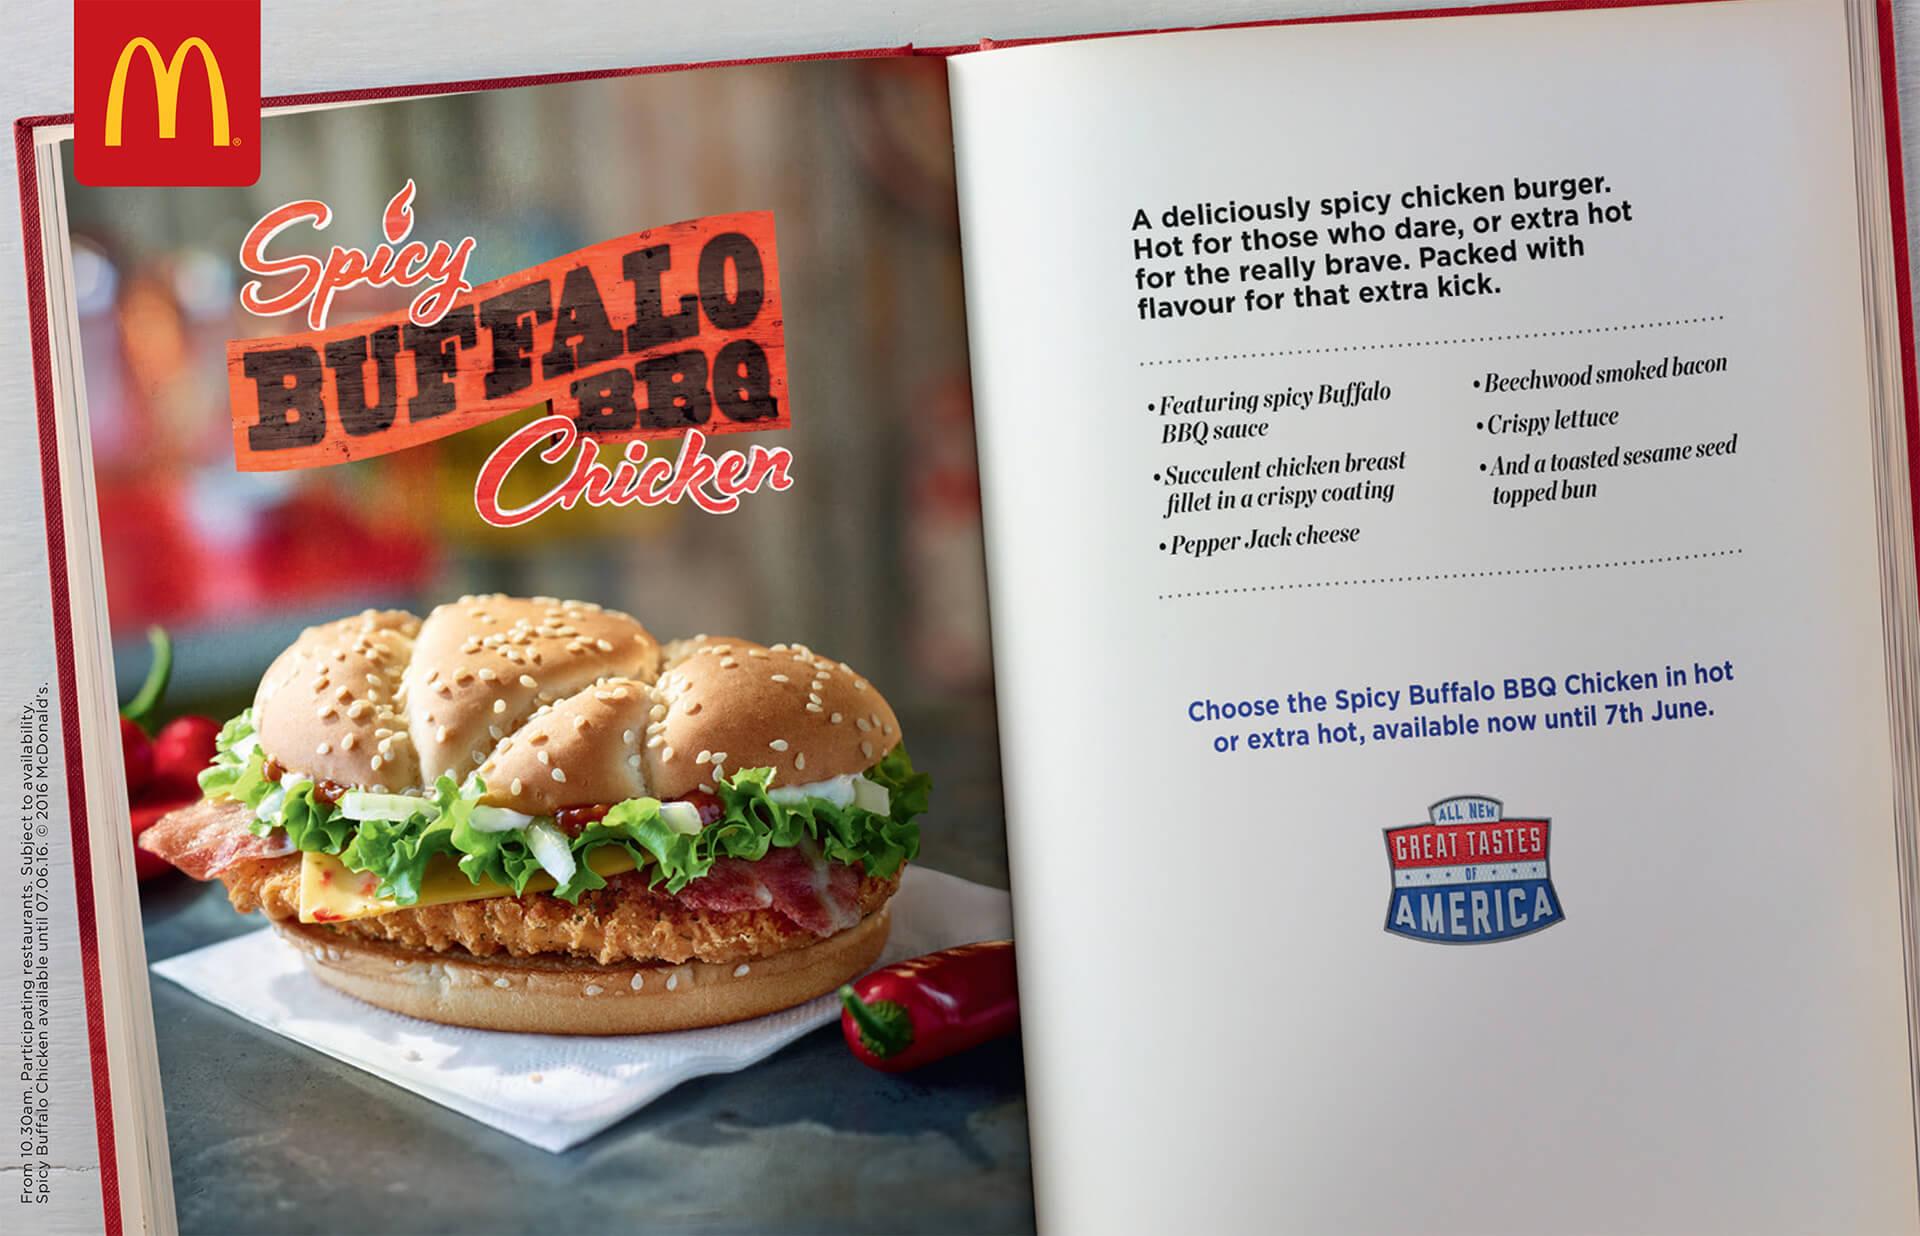 McDonalds Great Tastes of America 1920px 01